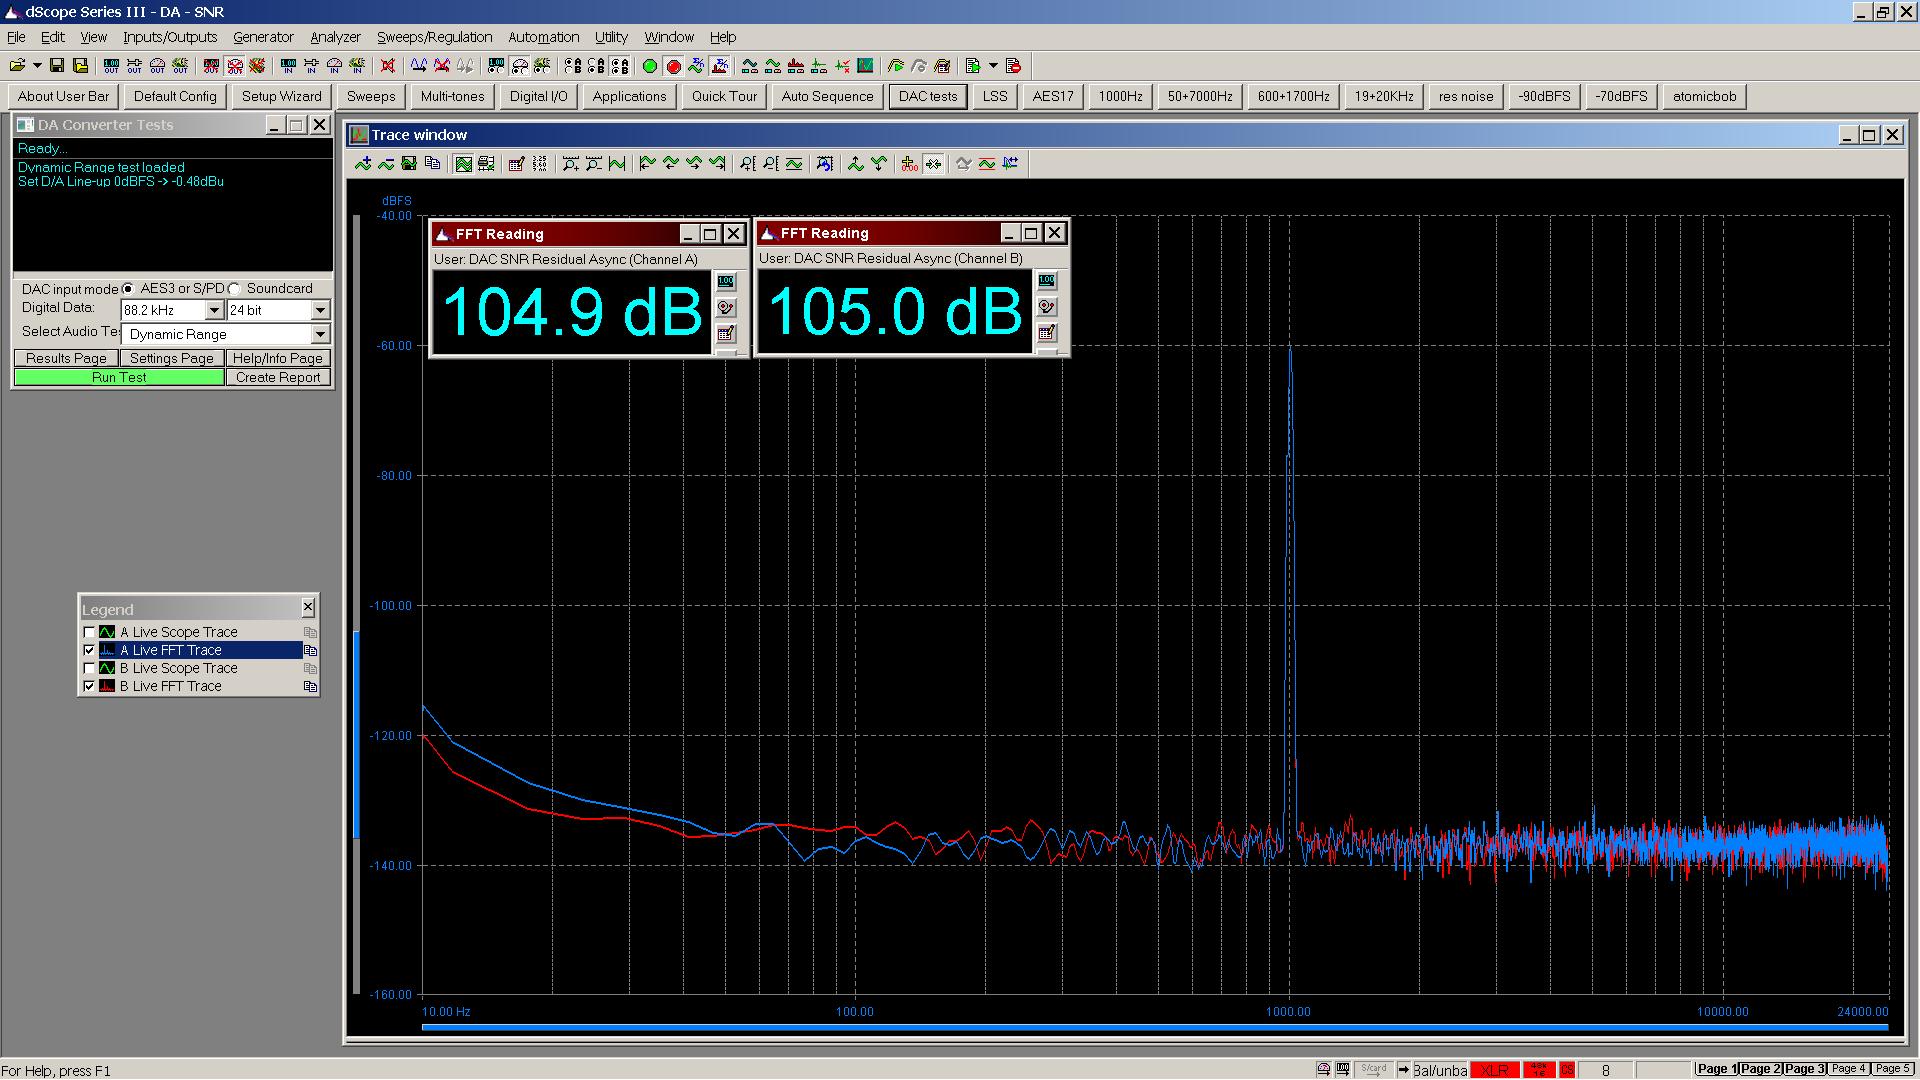 06 20190107-14 convert2 Bal dynamic range - AES -18dBFS ref 0 dBu out - ext atten.PNG